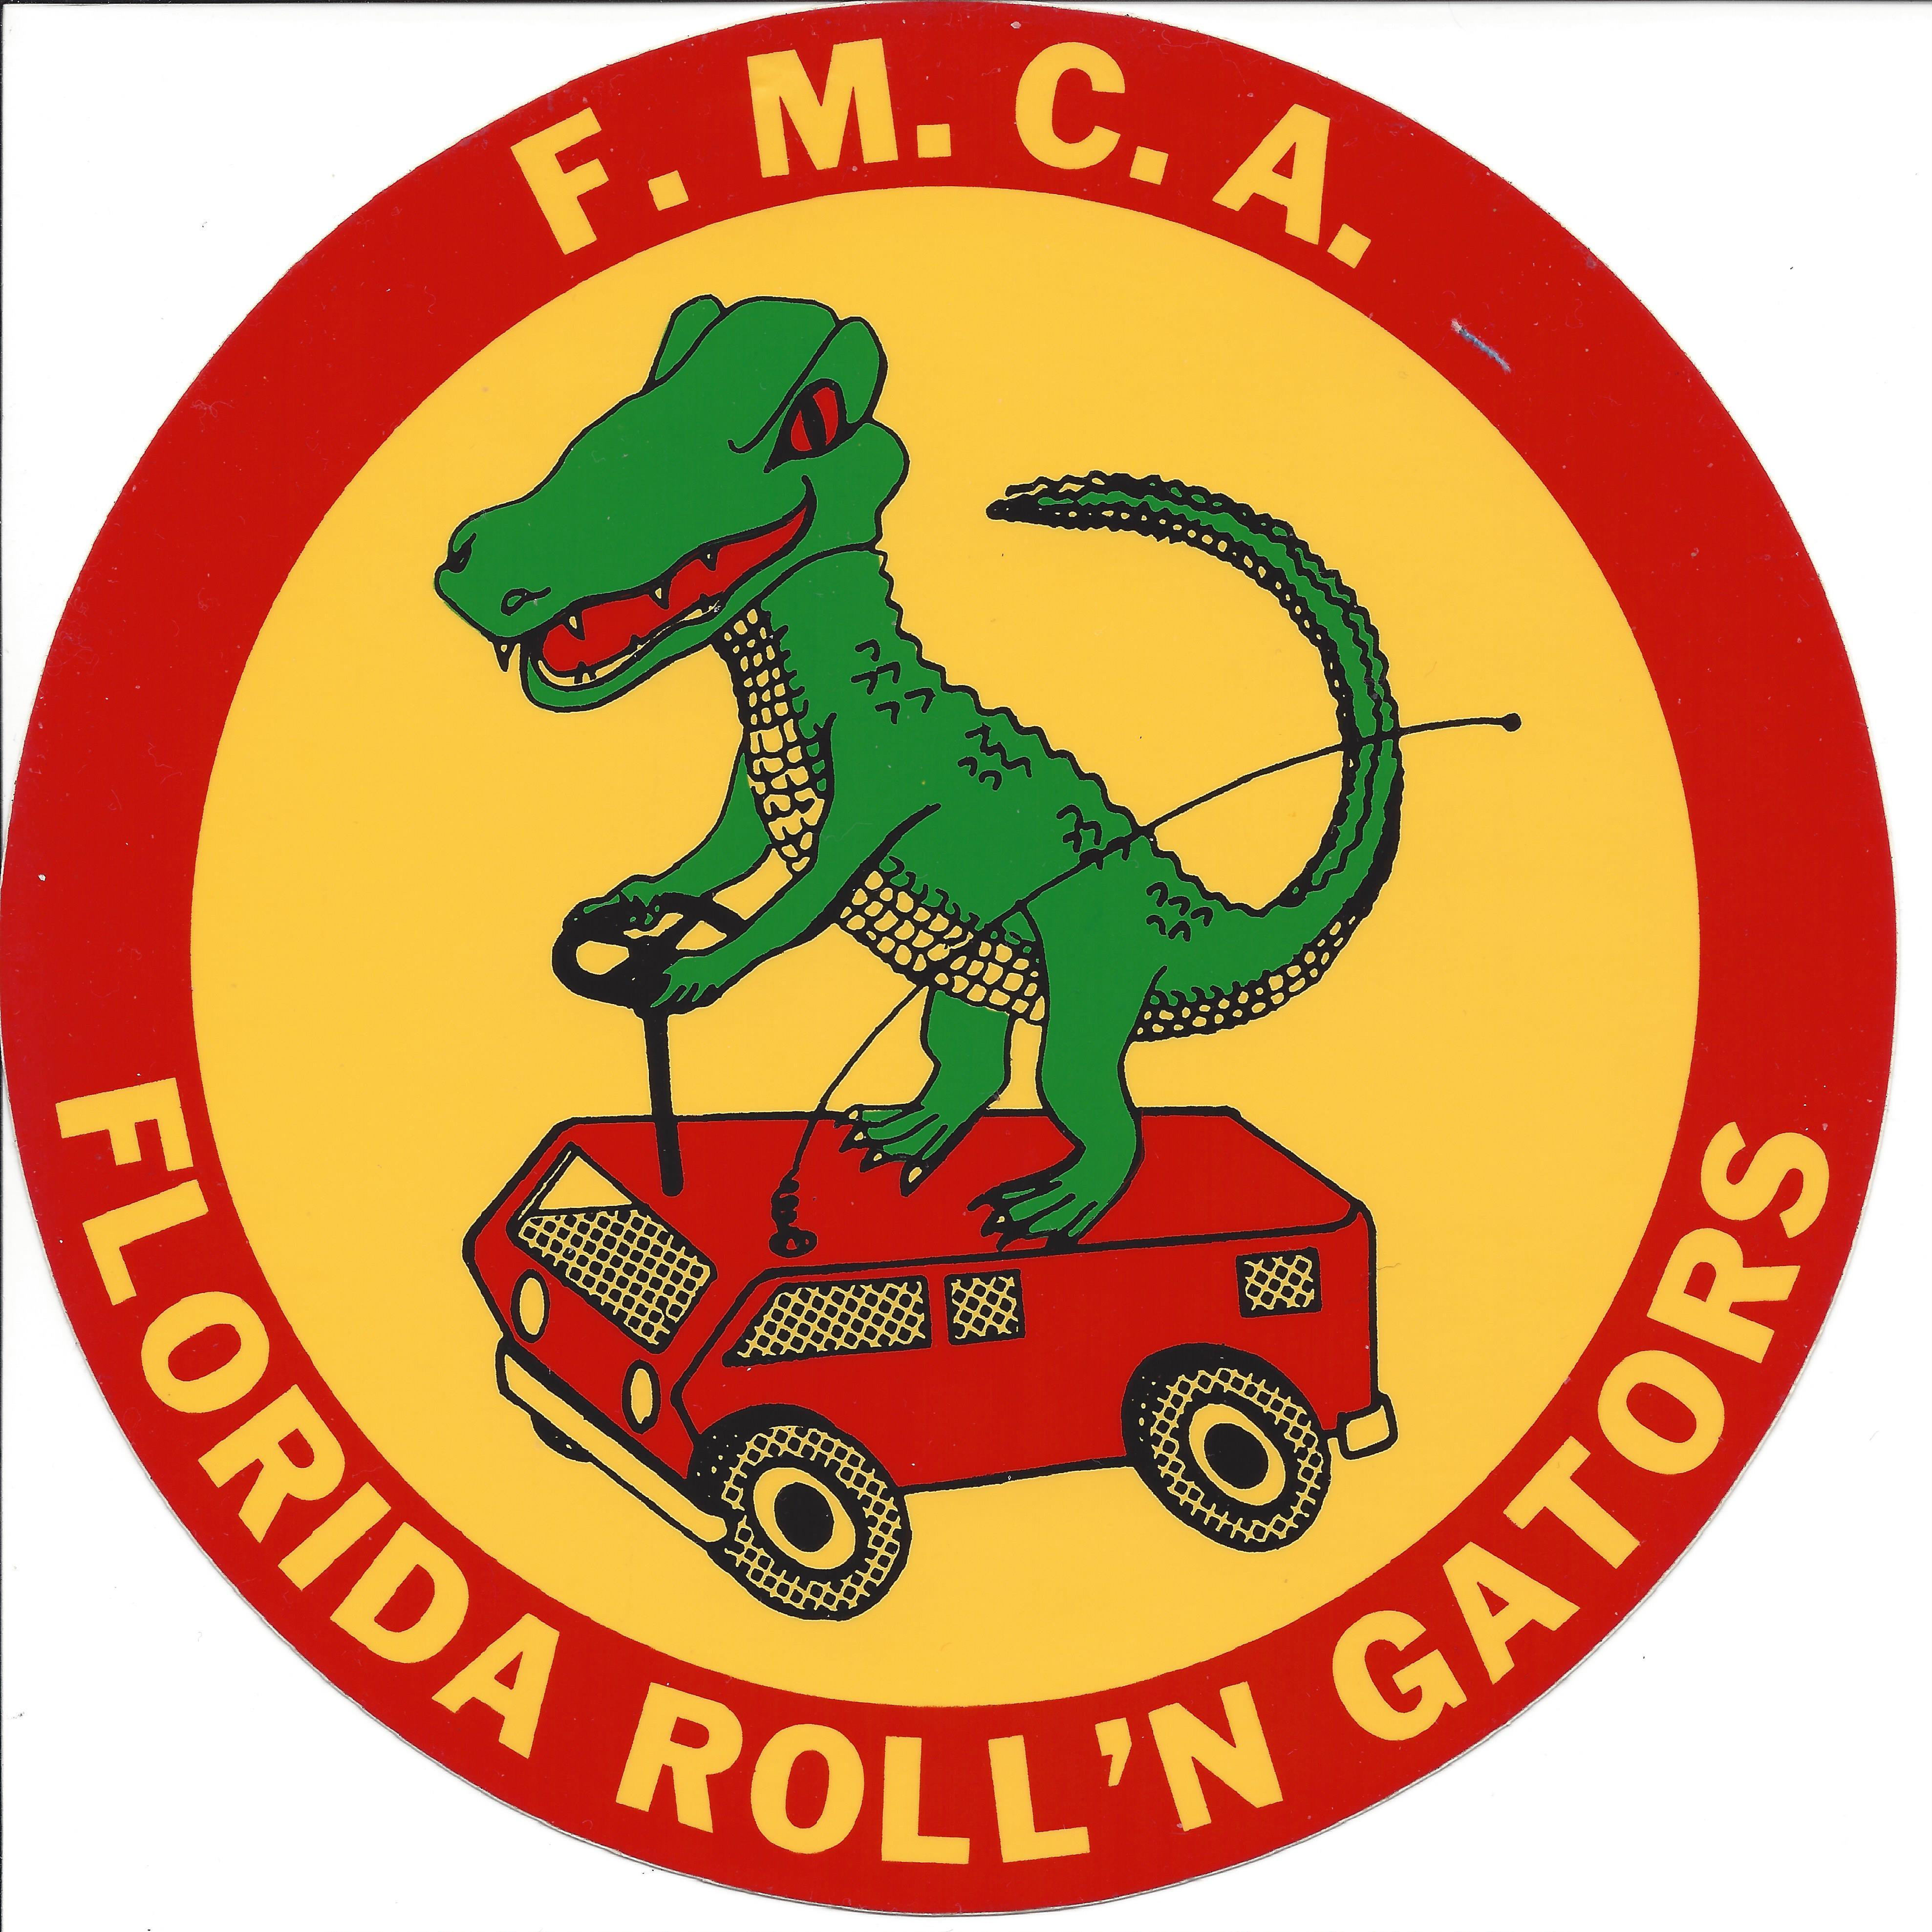 Florida Roll'n Gators